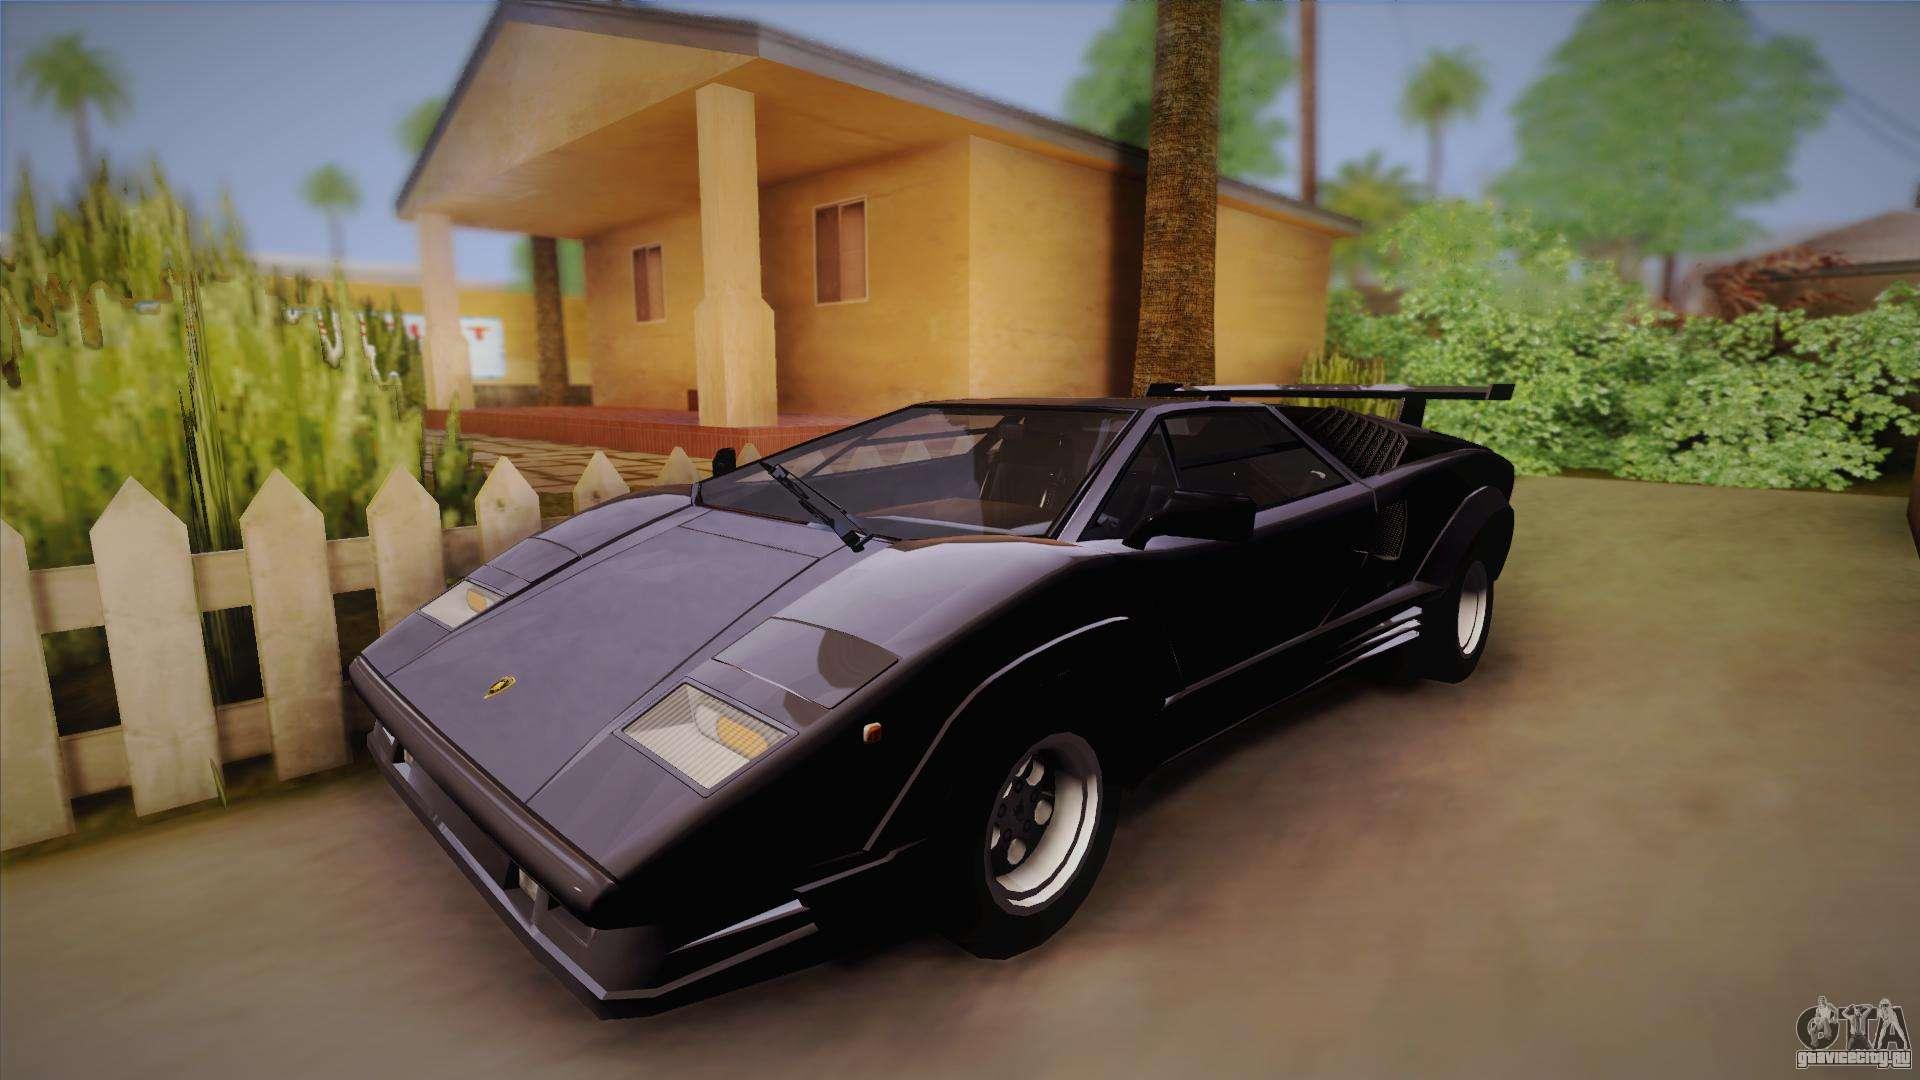 156600-gta-sa-2014-02-01-15-45-57-96 Surprising Lamborghini Countach 25th Anniversary asphalt 8 Cars Trend